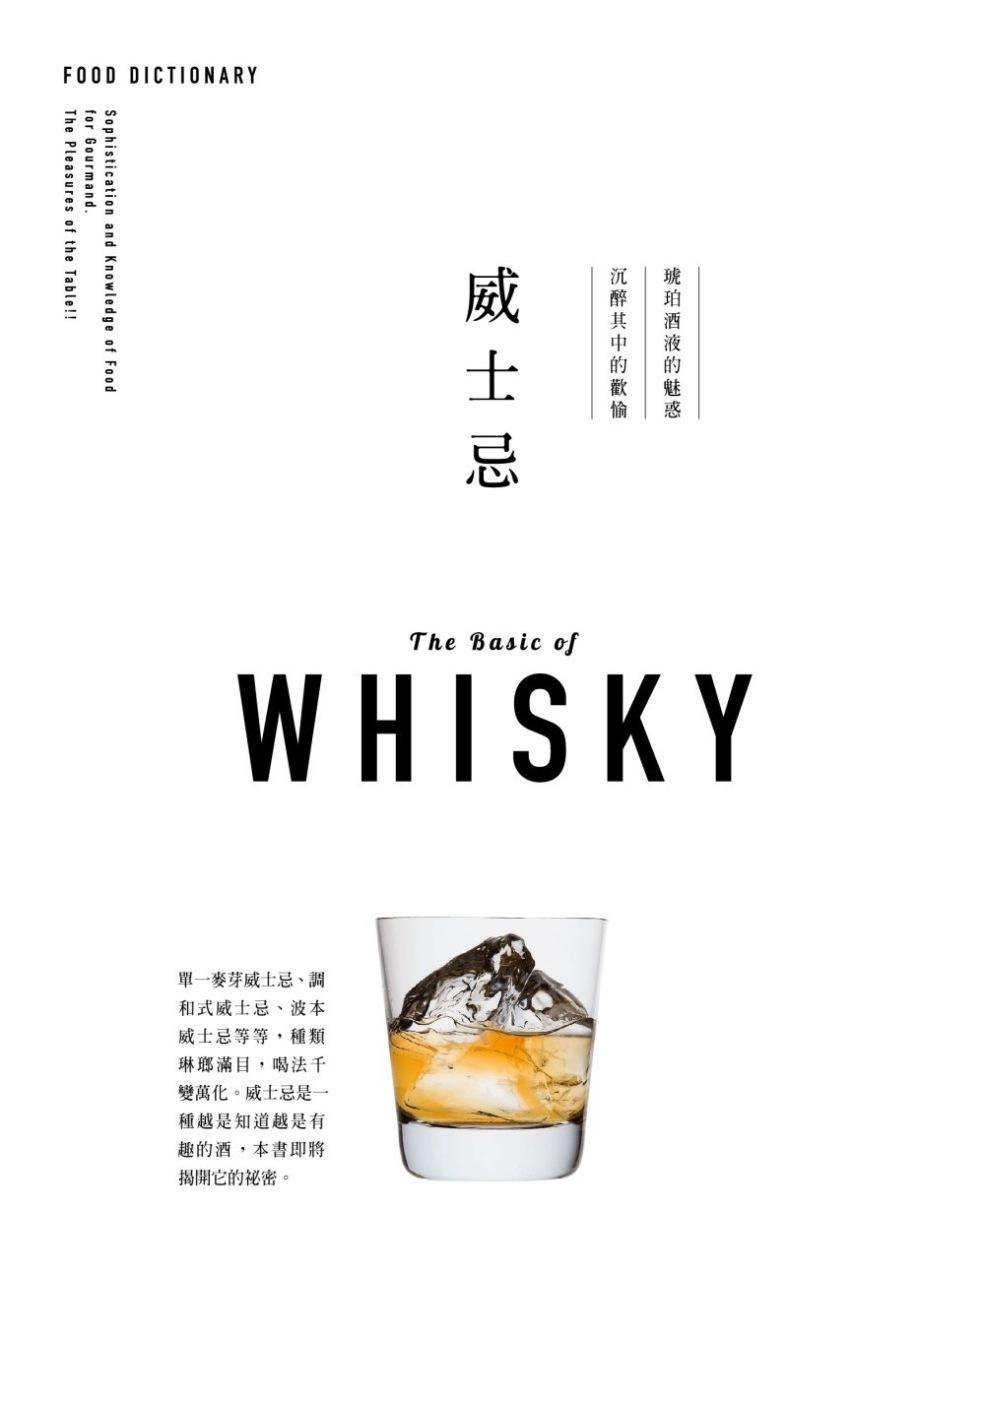 FOOD DICTIONARY 威士忌